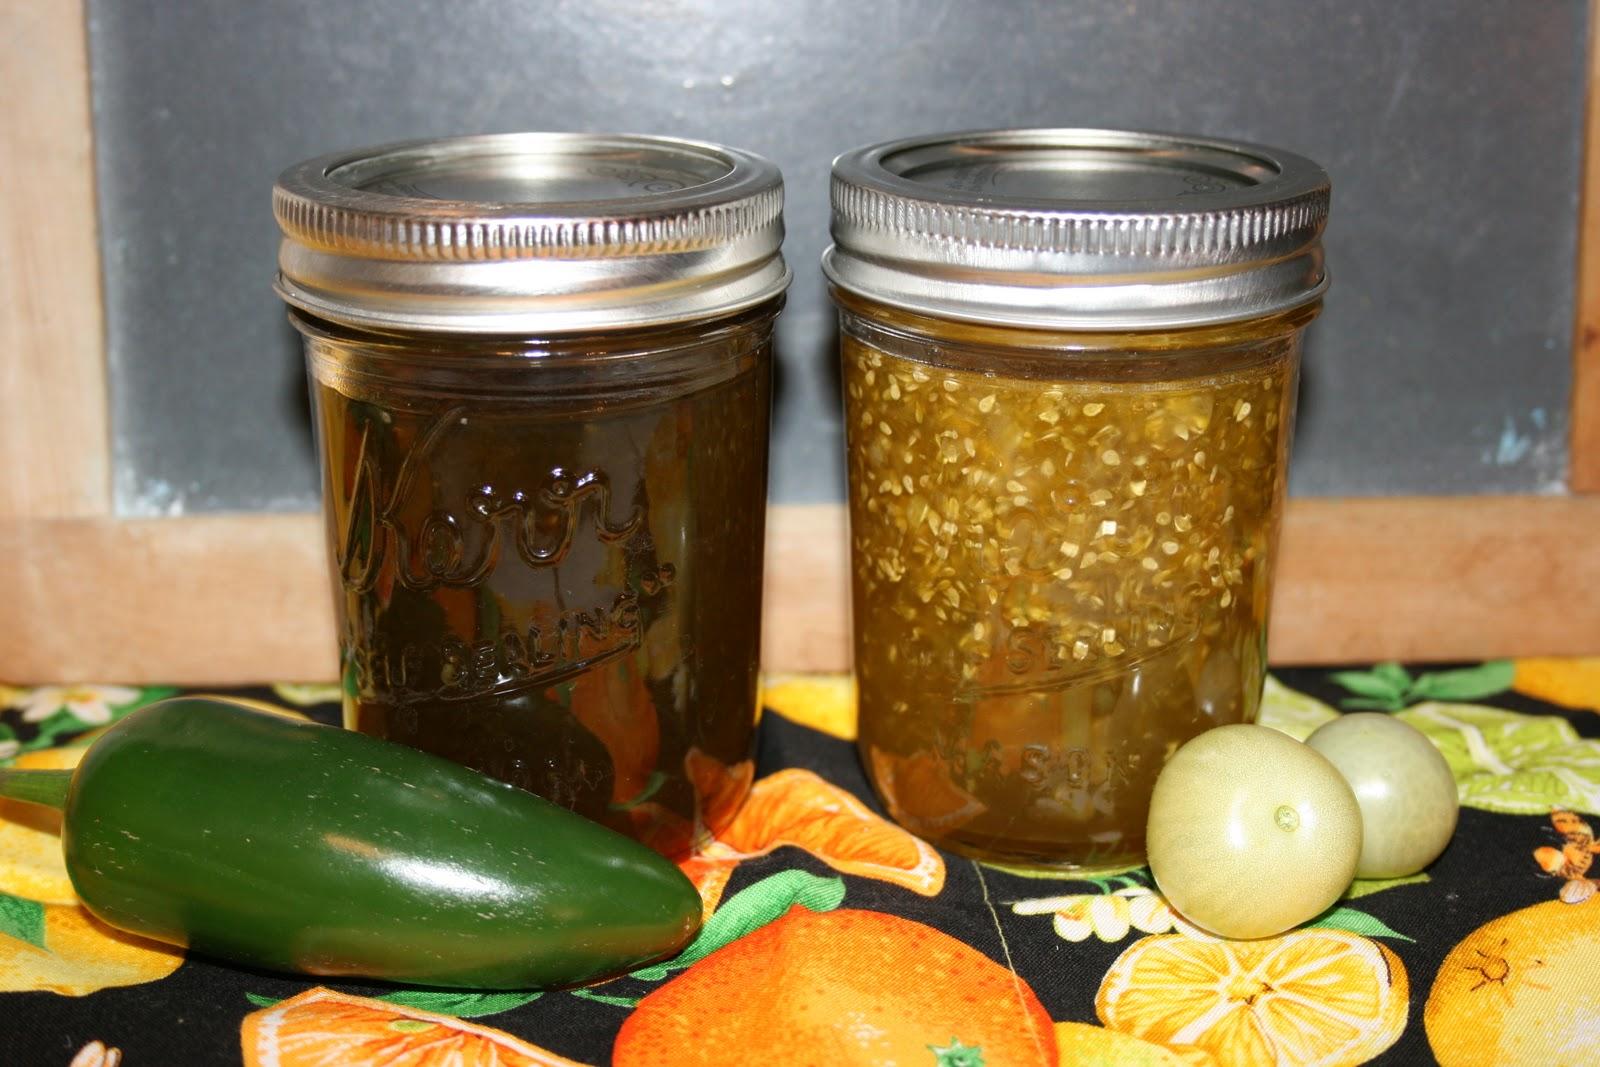 ... green tomato parmesan tomato and green bean salad fried green tomato